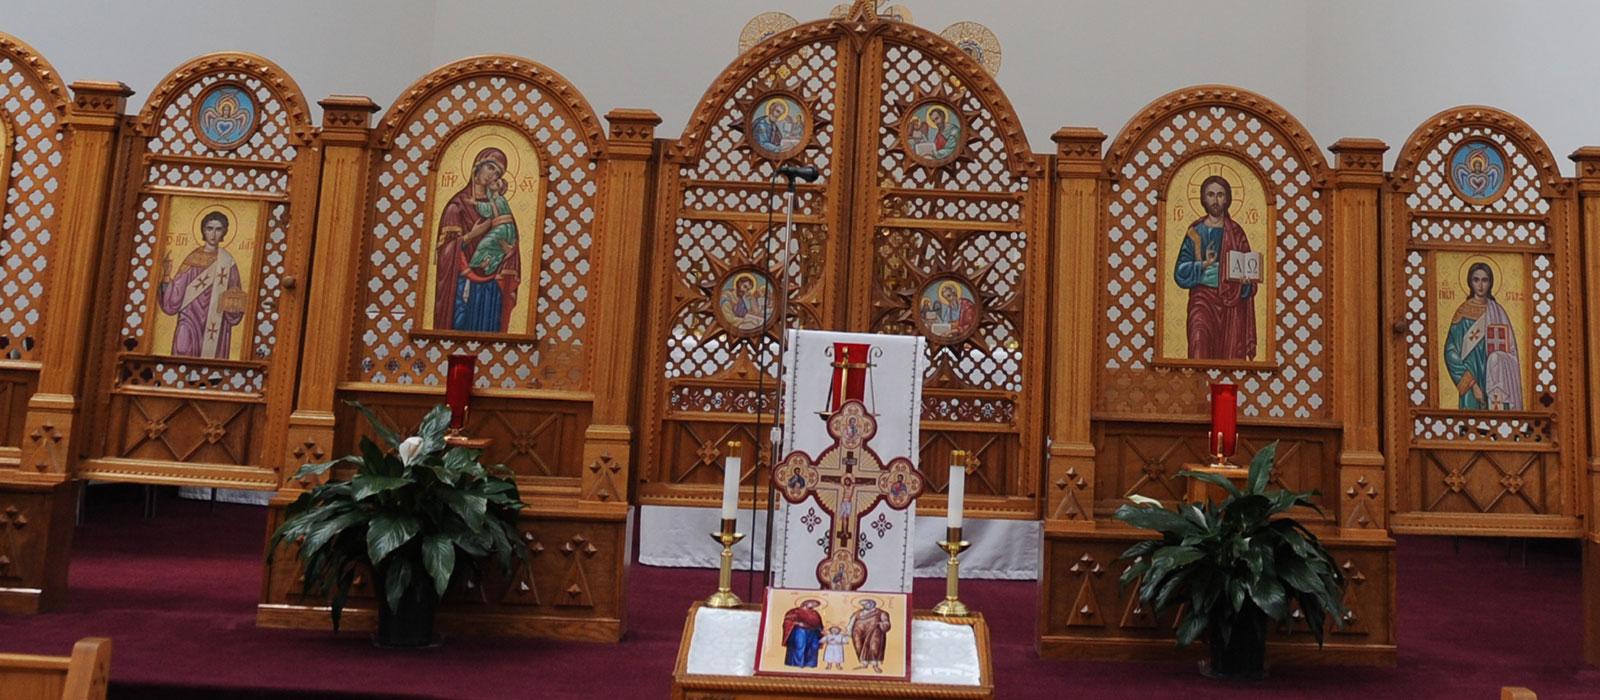 Church imagery